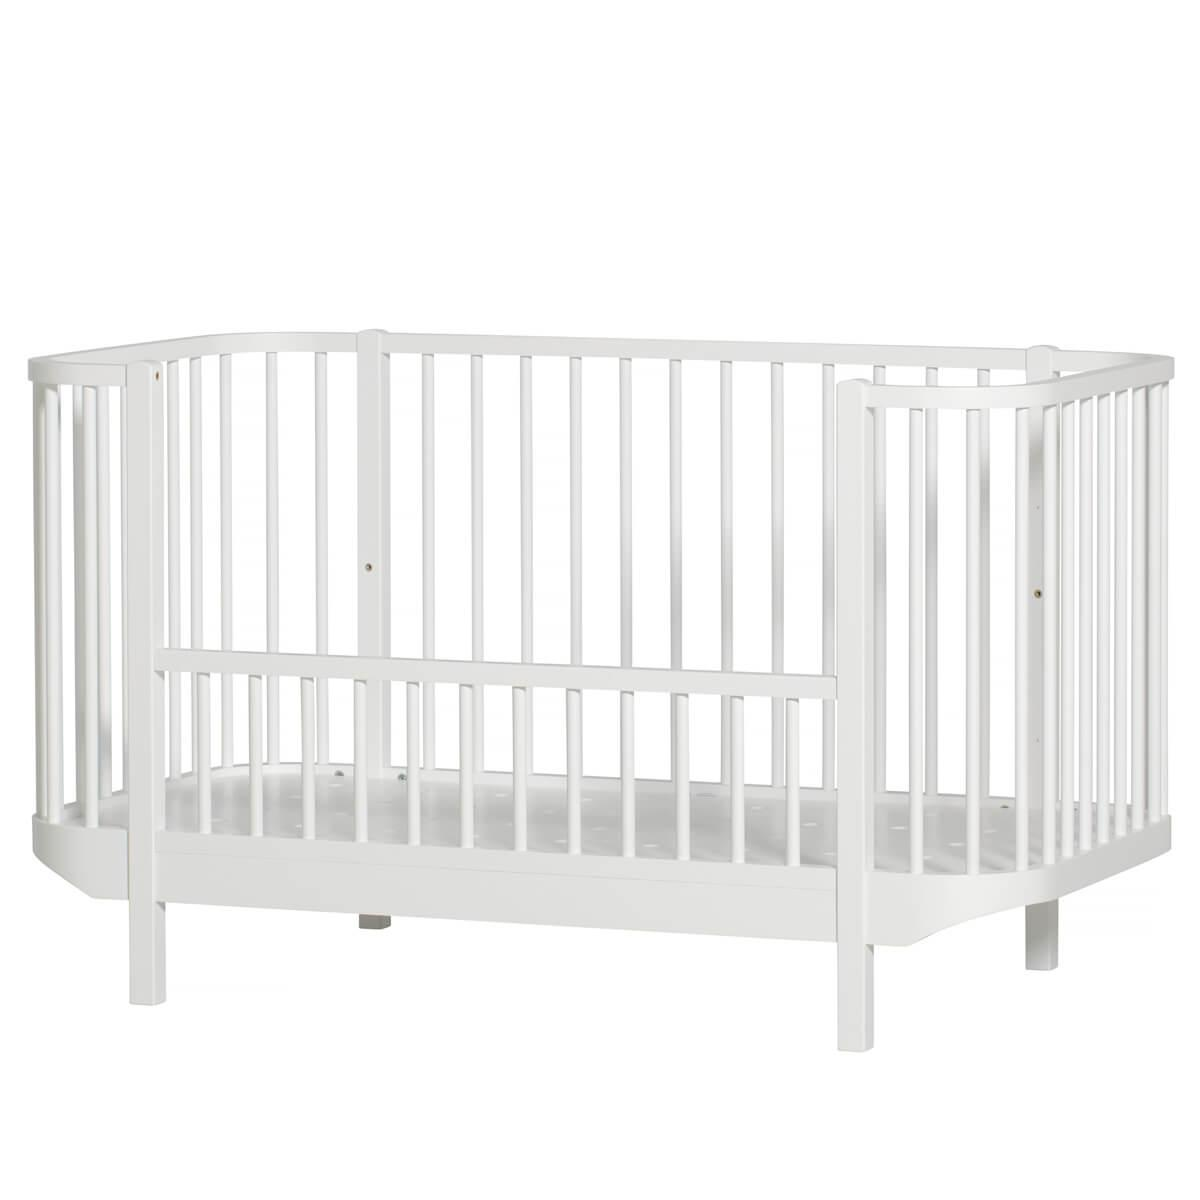 Lit bébé évolutif 70x140cm WOOD Oliver Furniture blanc